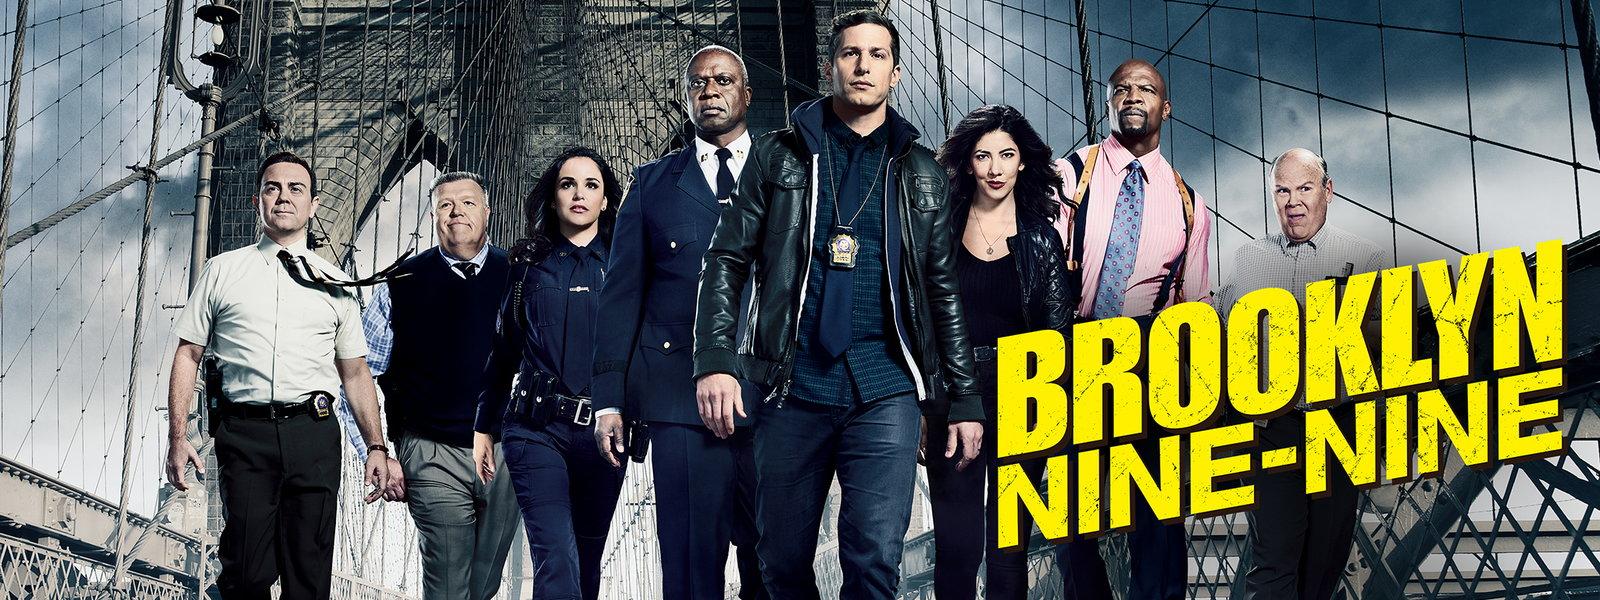 Bilderesultat for brooklyn nine nine